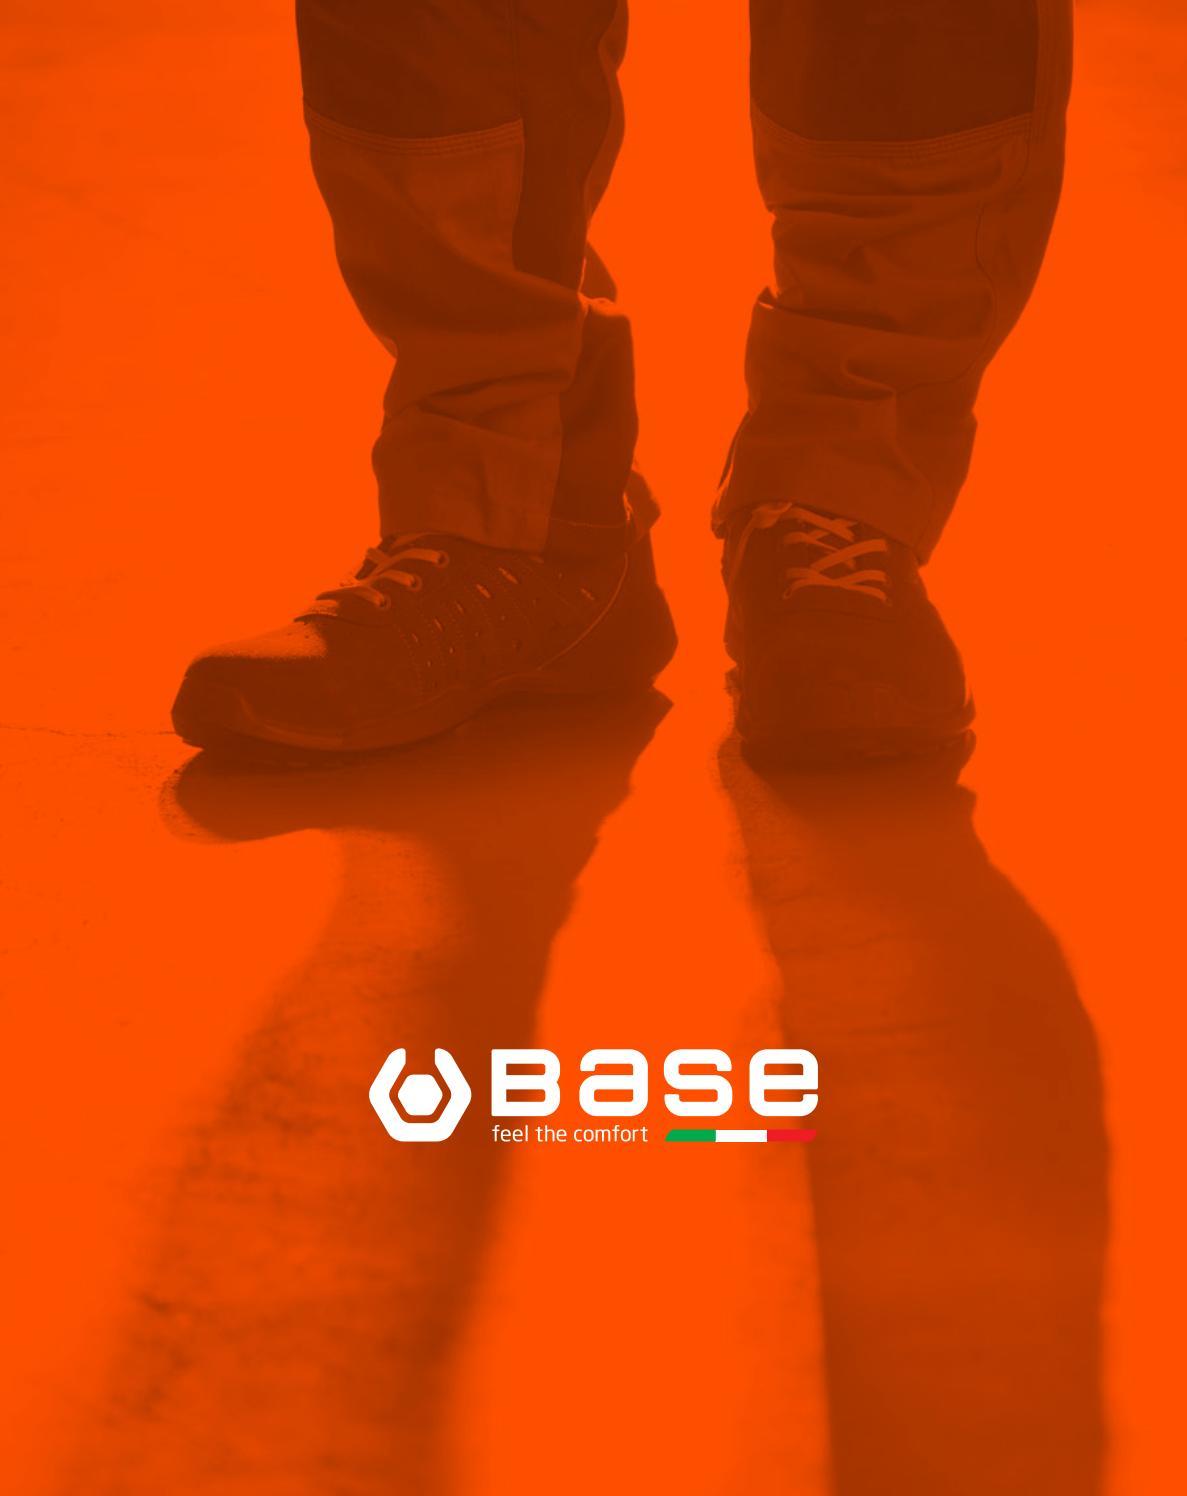 Base protection veiligheidsschoenen 2017 by Kledingcalculator.nl - issuu bf2b48fcc54